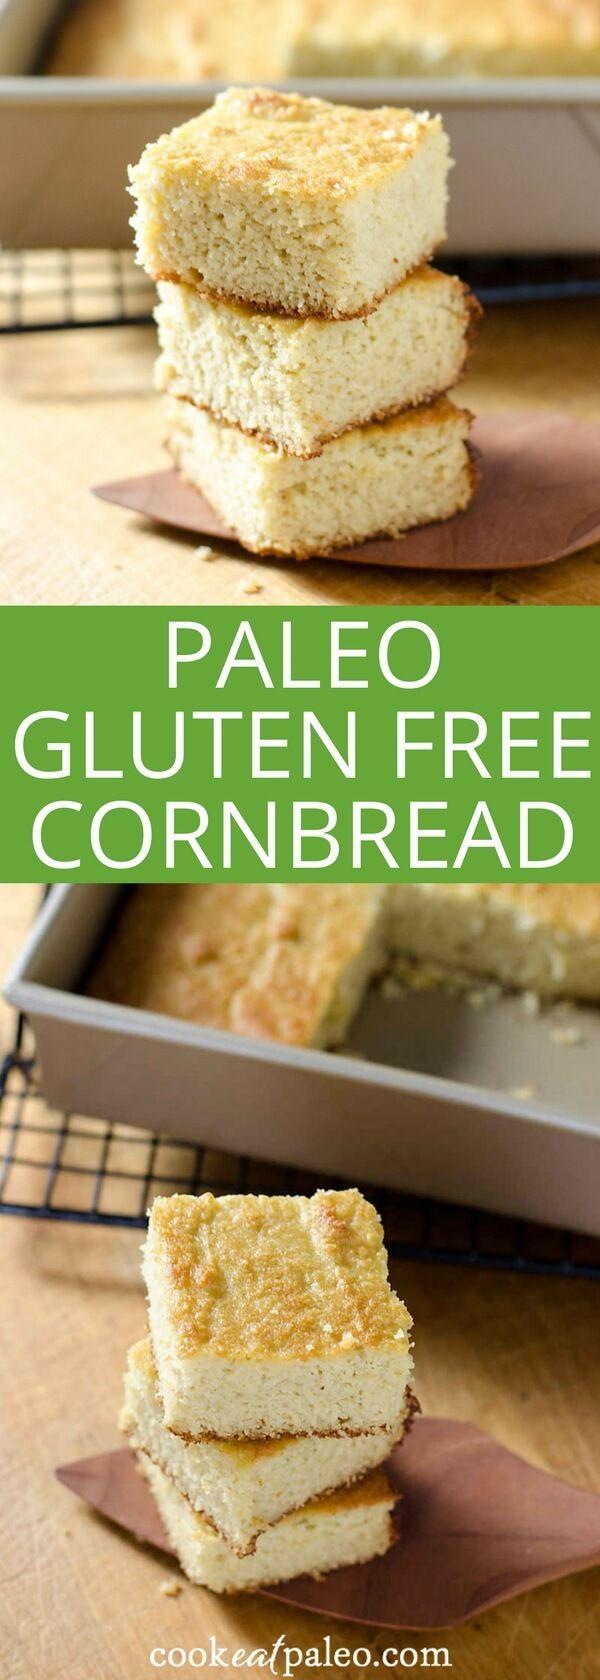 Paleo Gluten Free Cornbread Recipe - make this easy gluten-free cornbread - it's paleo, grain-free, and refined sugar-free.   Cook Eat Paleo via /cookeatpaleo/